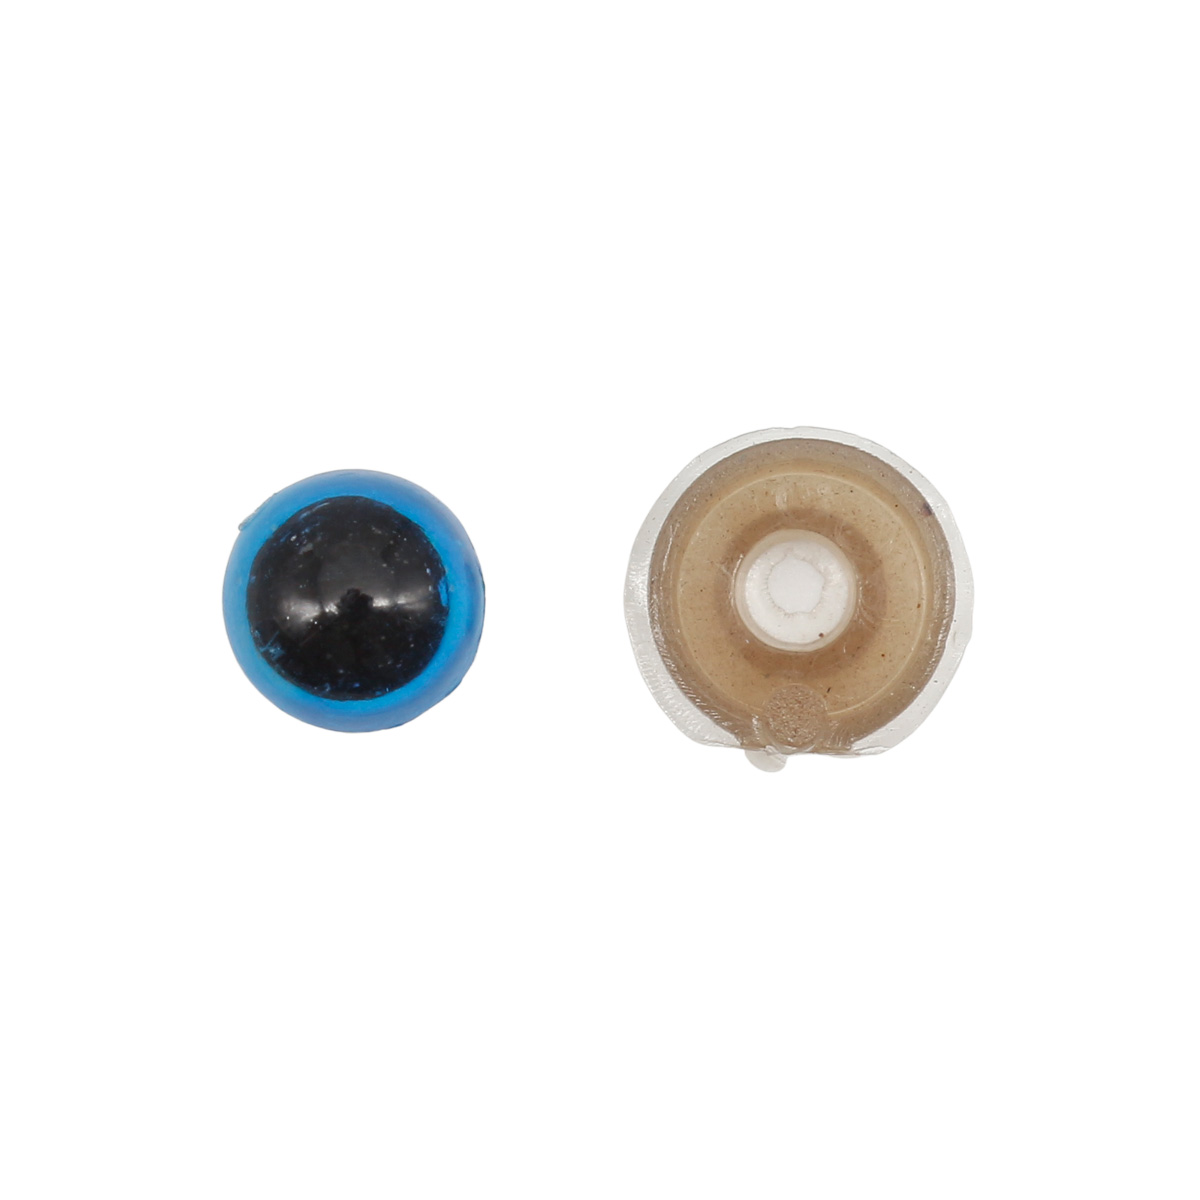 28695 Глазки пласт. с фиксатором № 4. 8мм*14мм, упак./10 шт., цв. голуб.